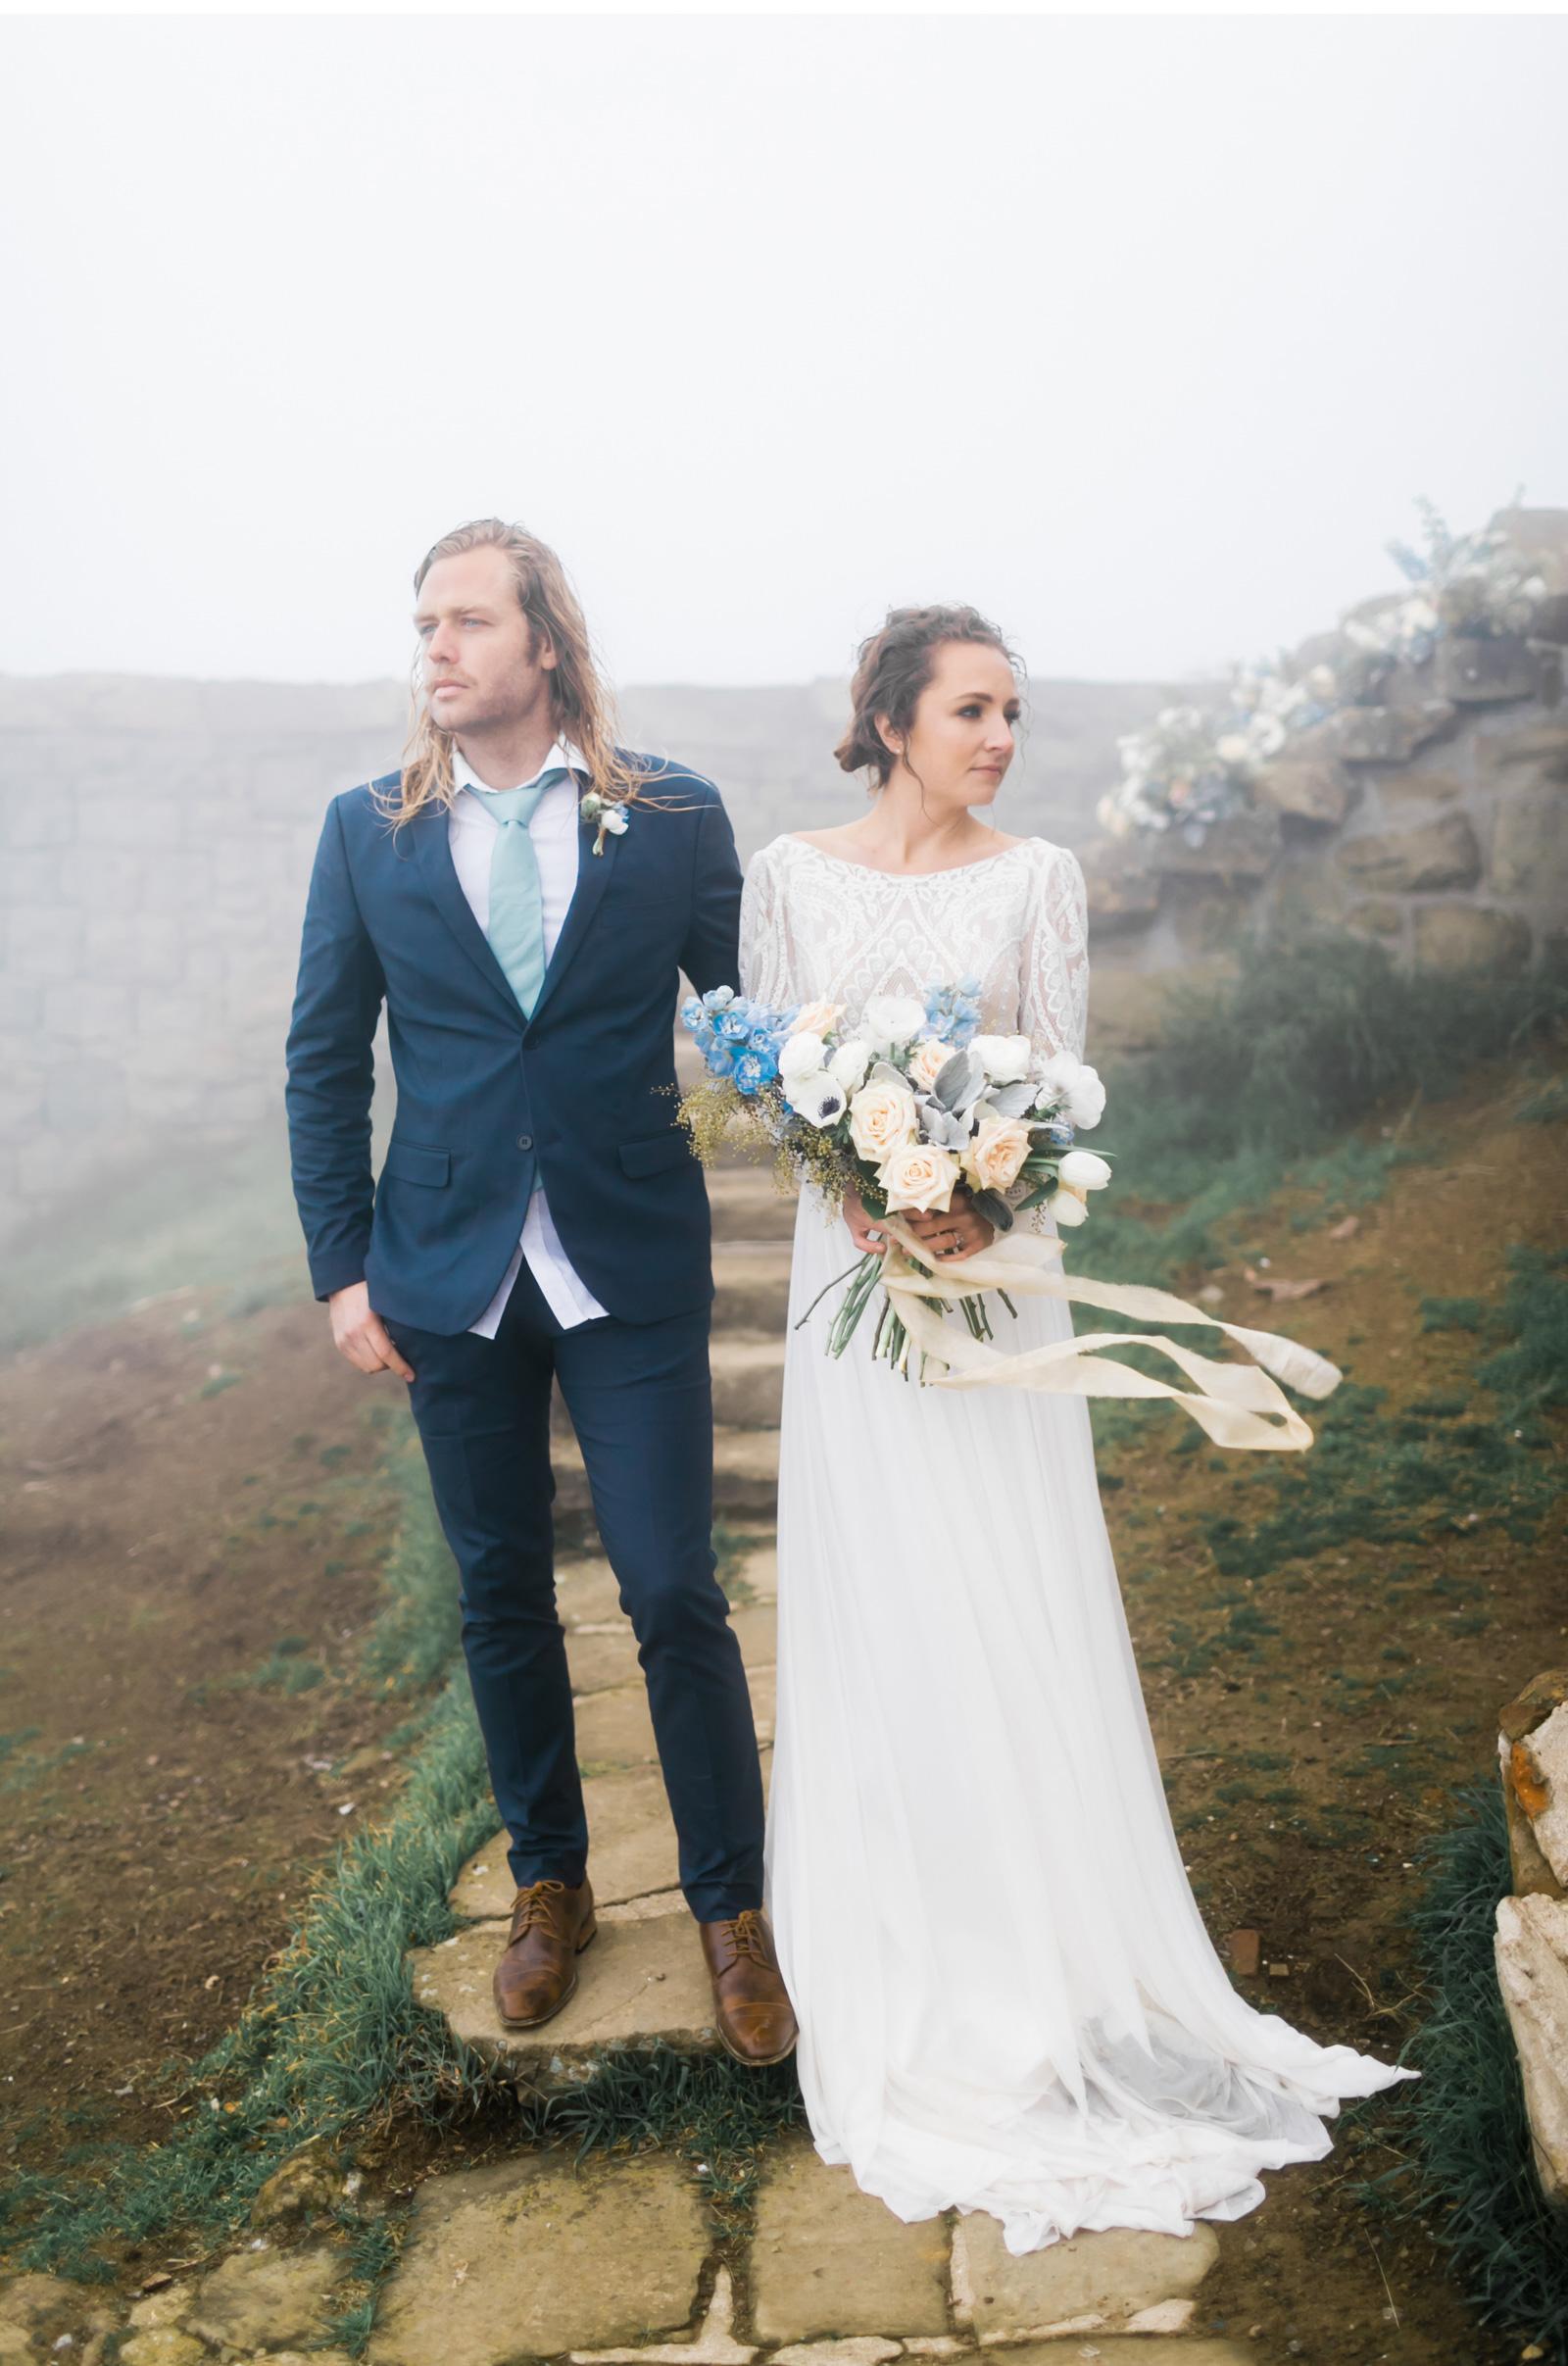 San-Luis-Obispo-Wedding-Fine-Art-Style-Me-Pretty-Natalie-Schutt-Photography_01.jpg